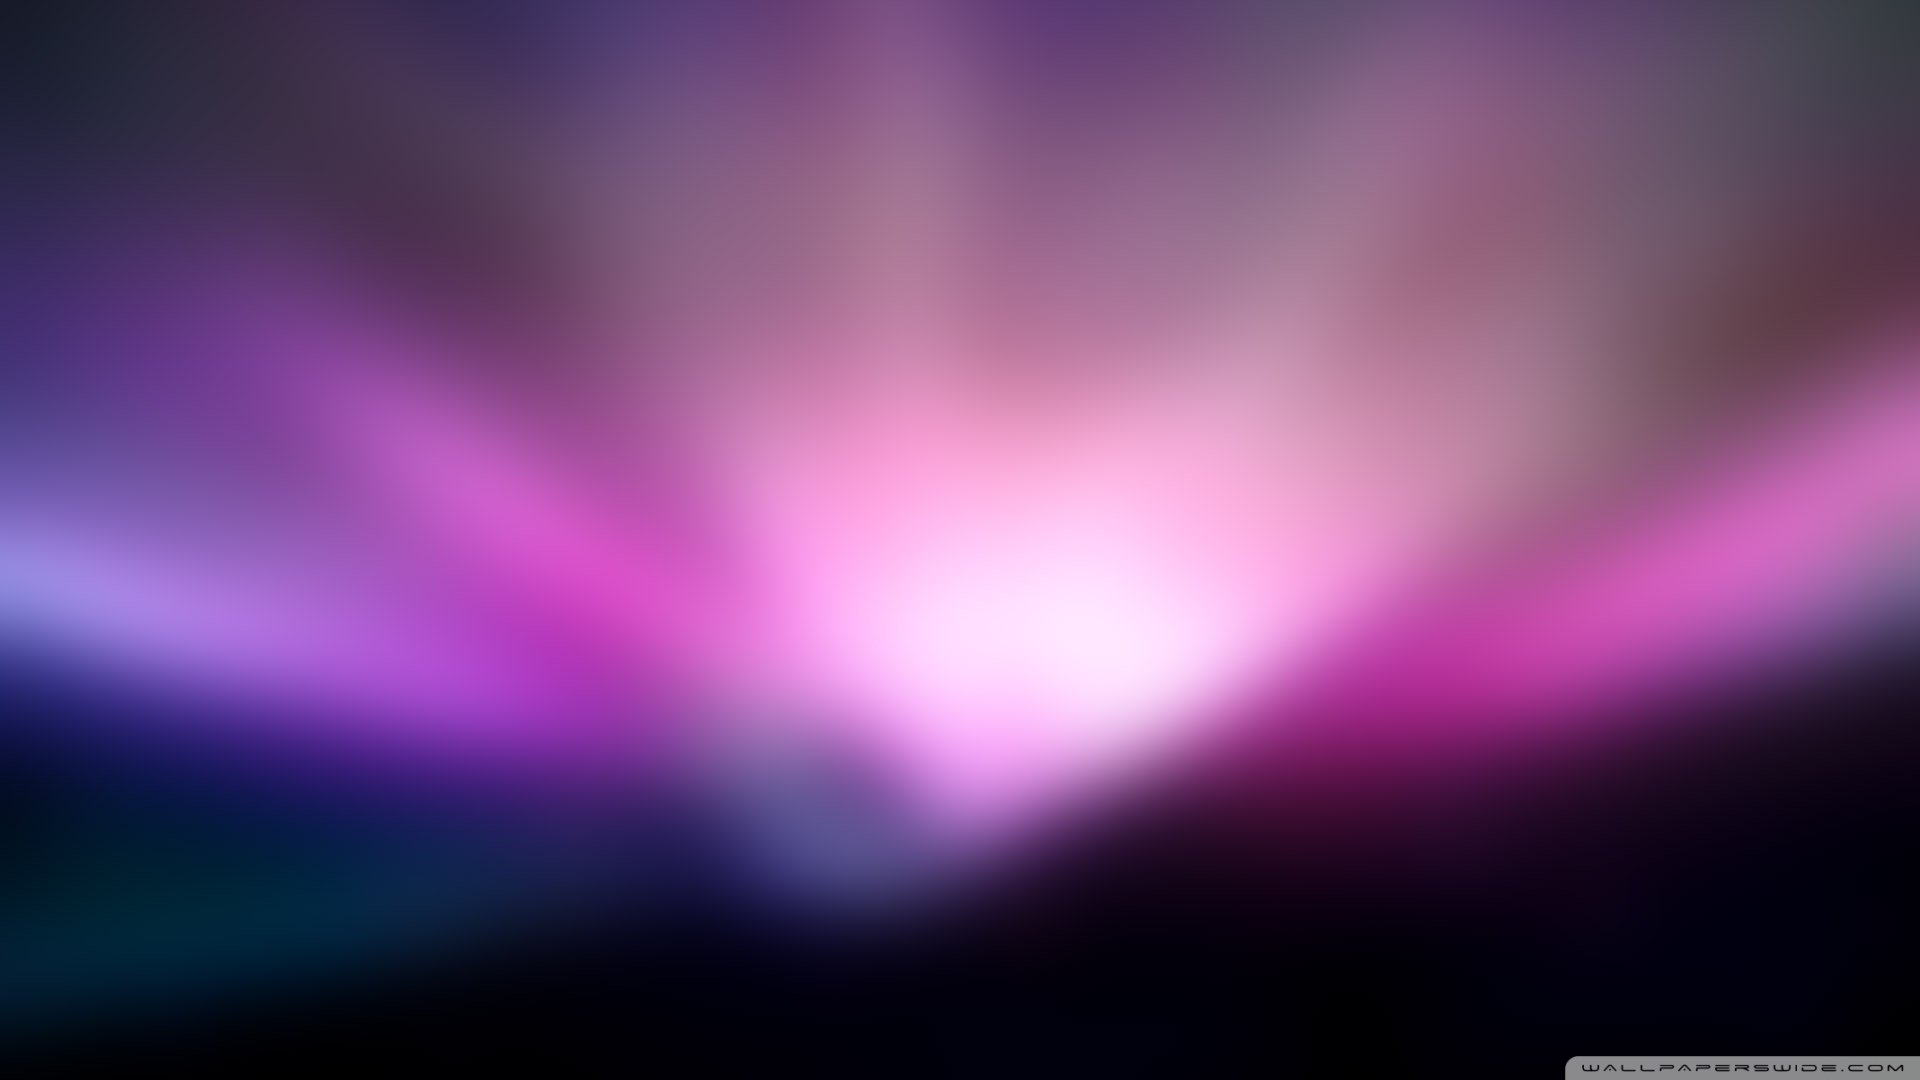 Mac Os X Snow Leopard Wallpaper